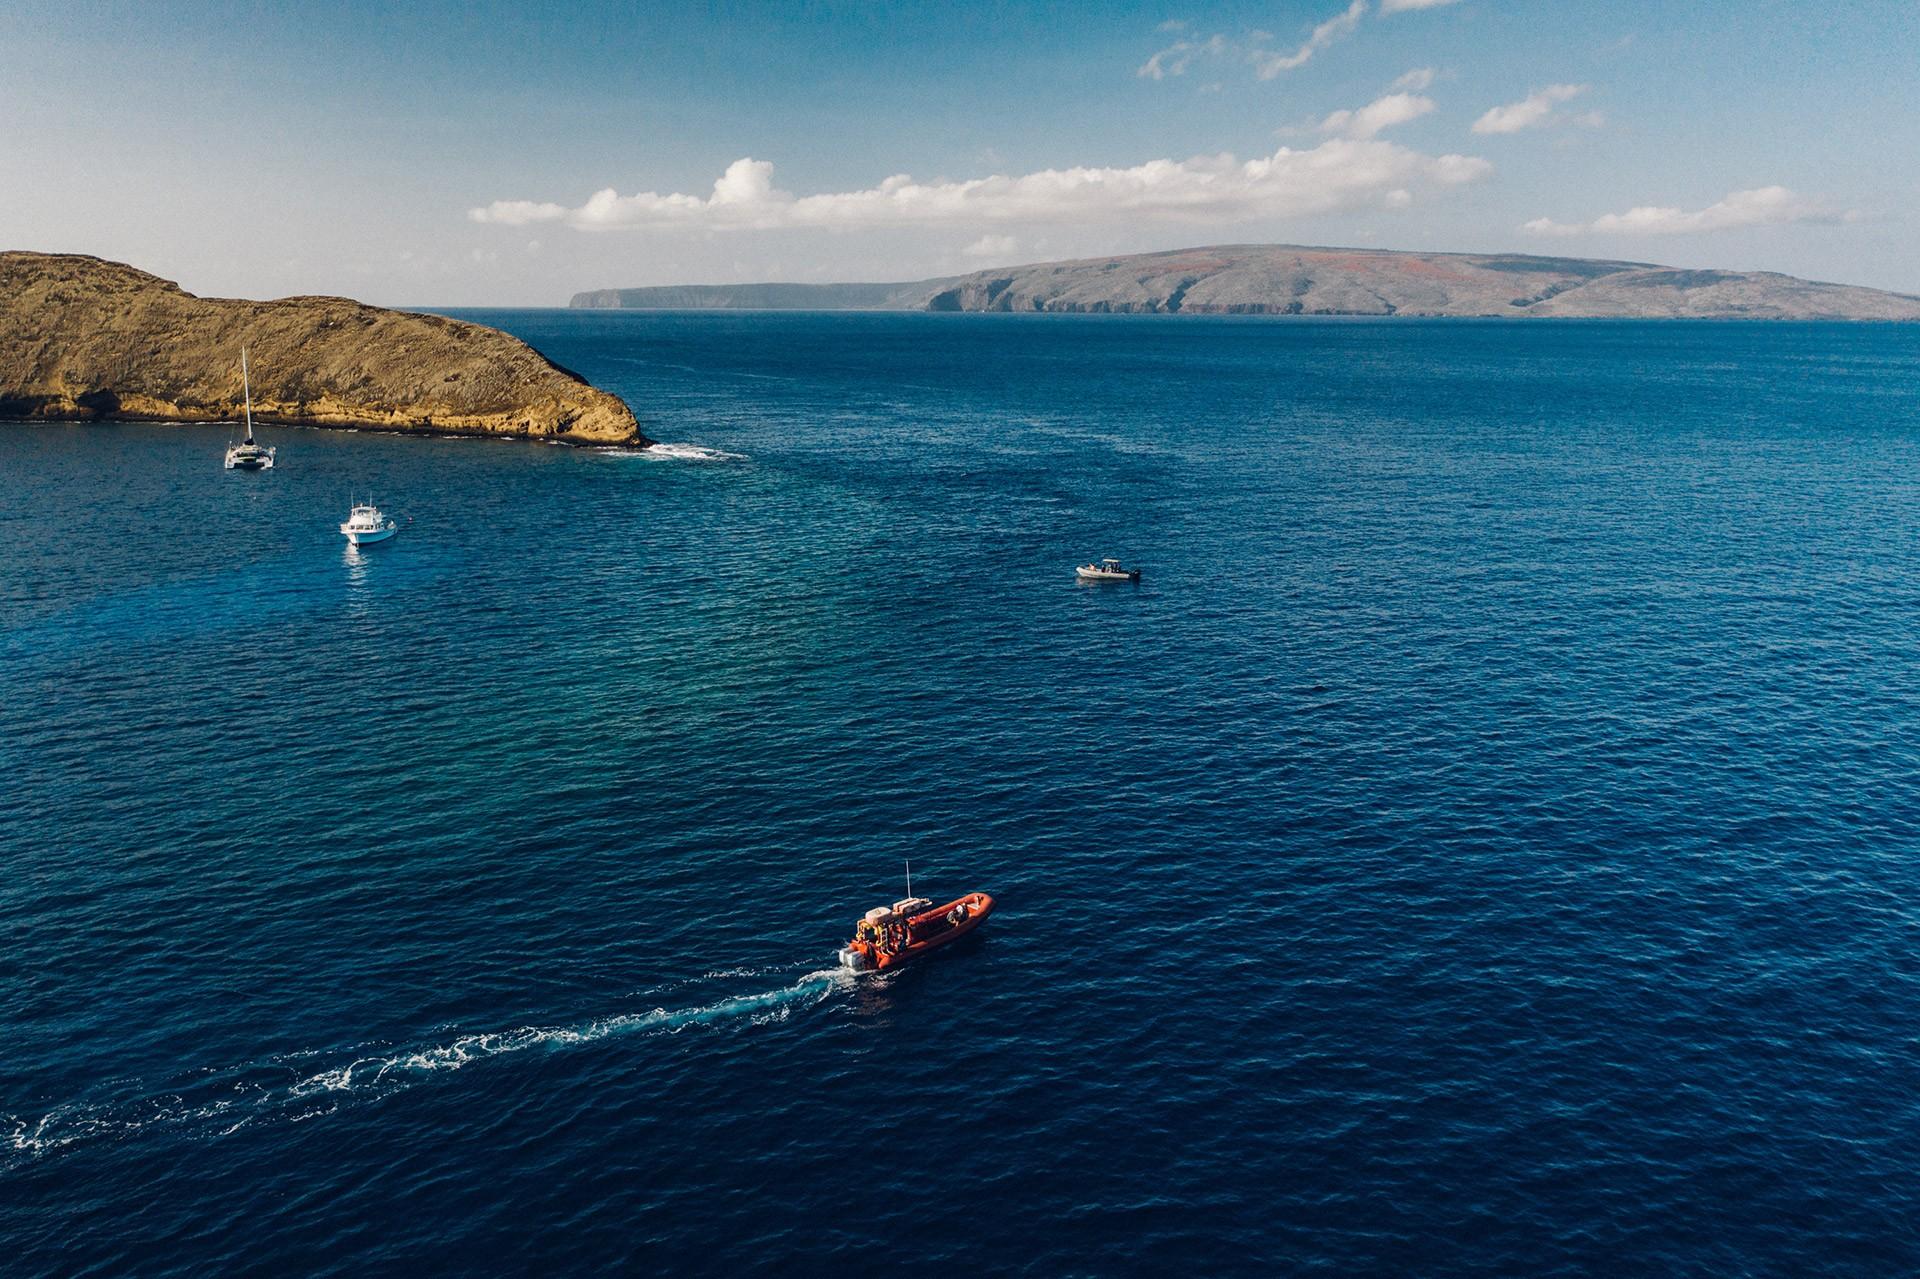 Redline Rafting Molikini Snorkel Tours